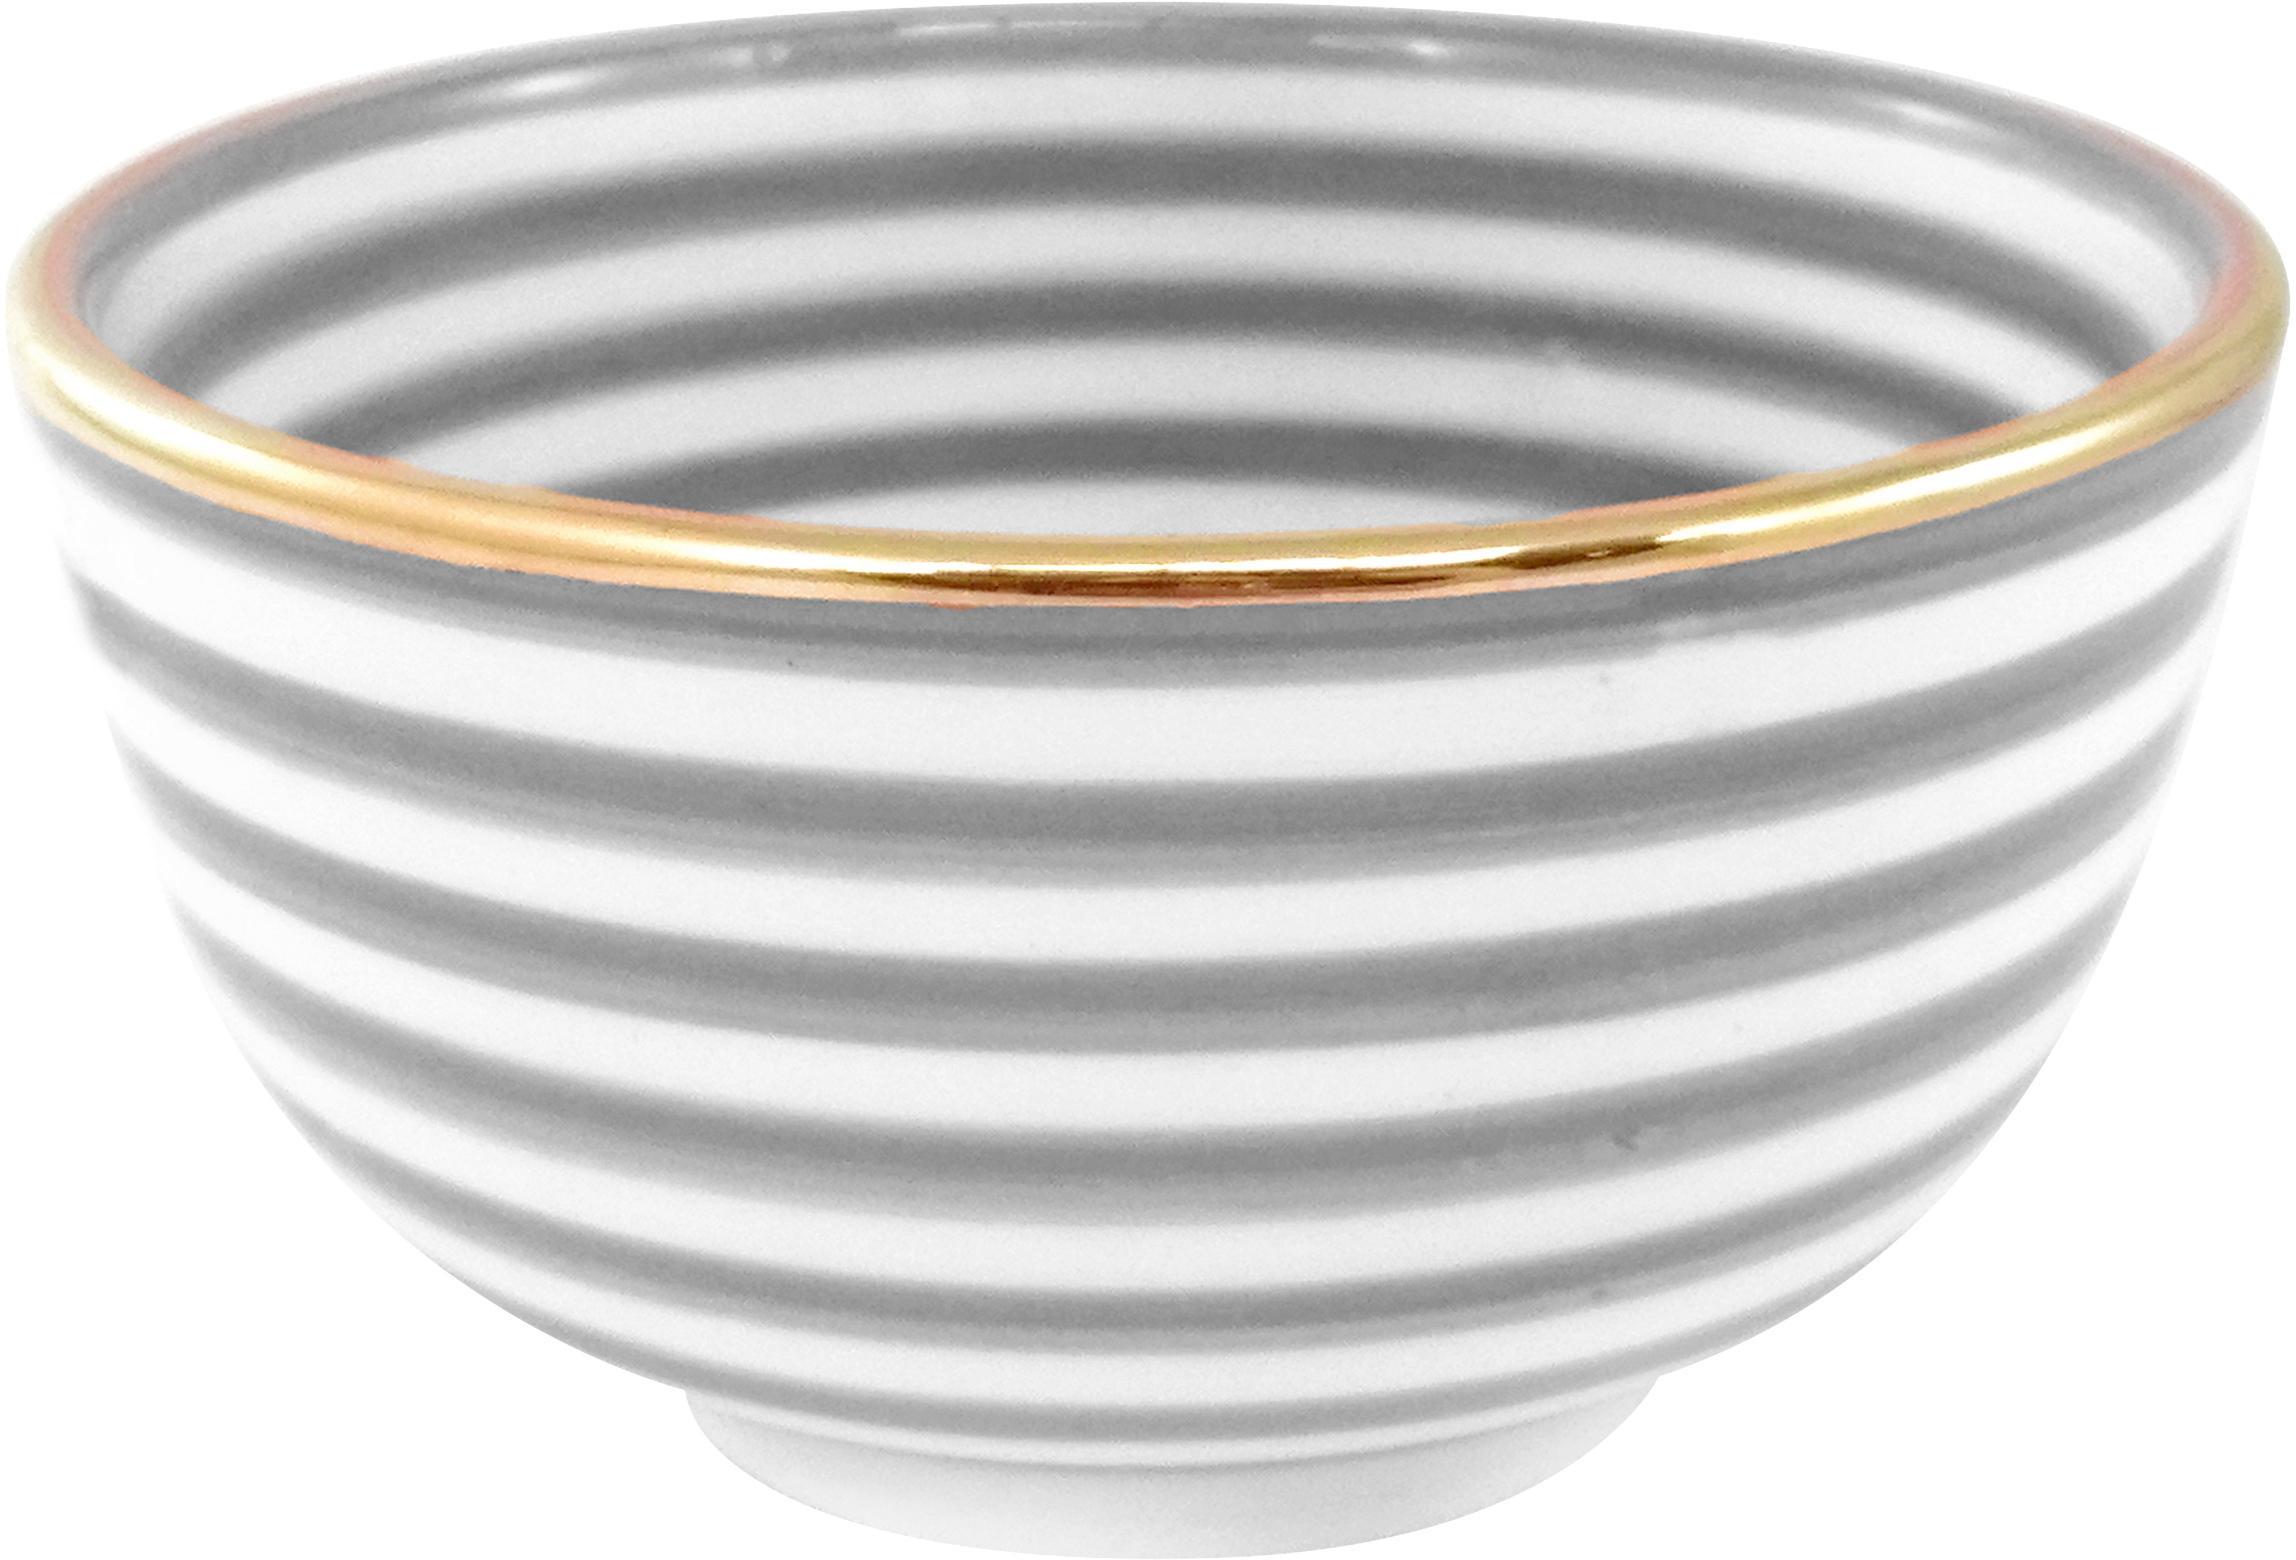 Handgemachte Salatschüssel Couleur mit Goldrand, Keramik, Hellgrau, Cremefarben, Gold, Ø 25 x H 12 cm